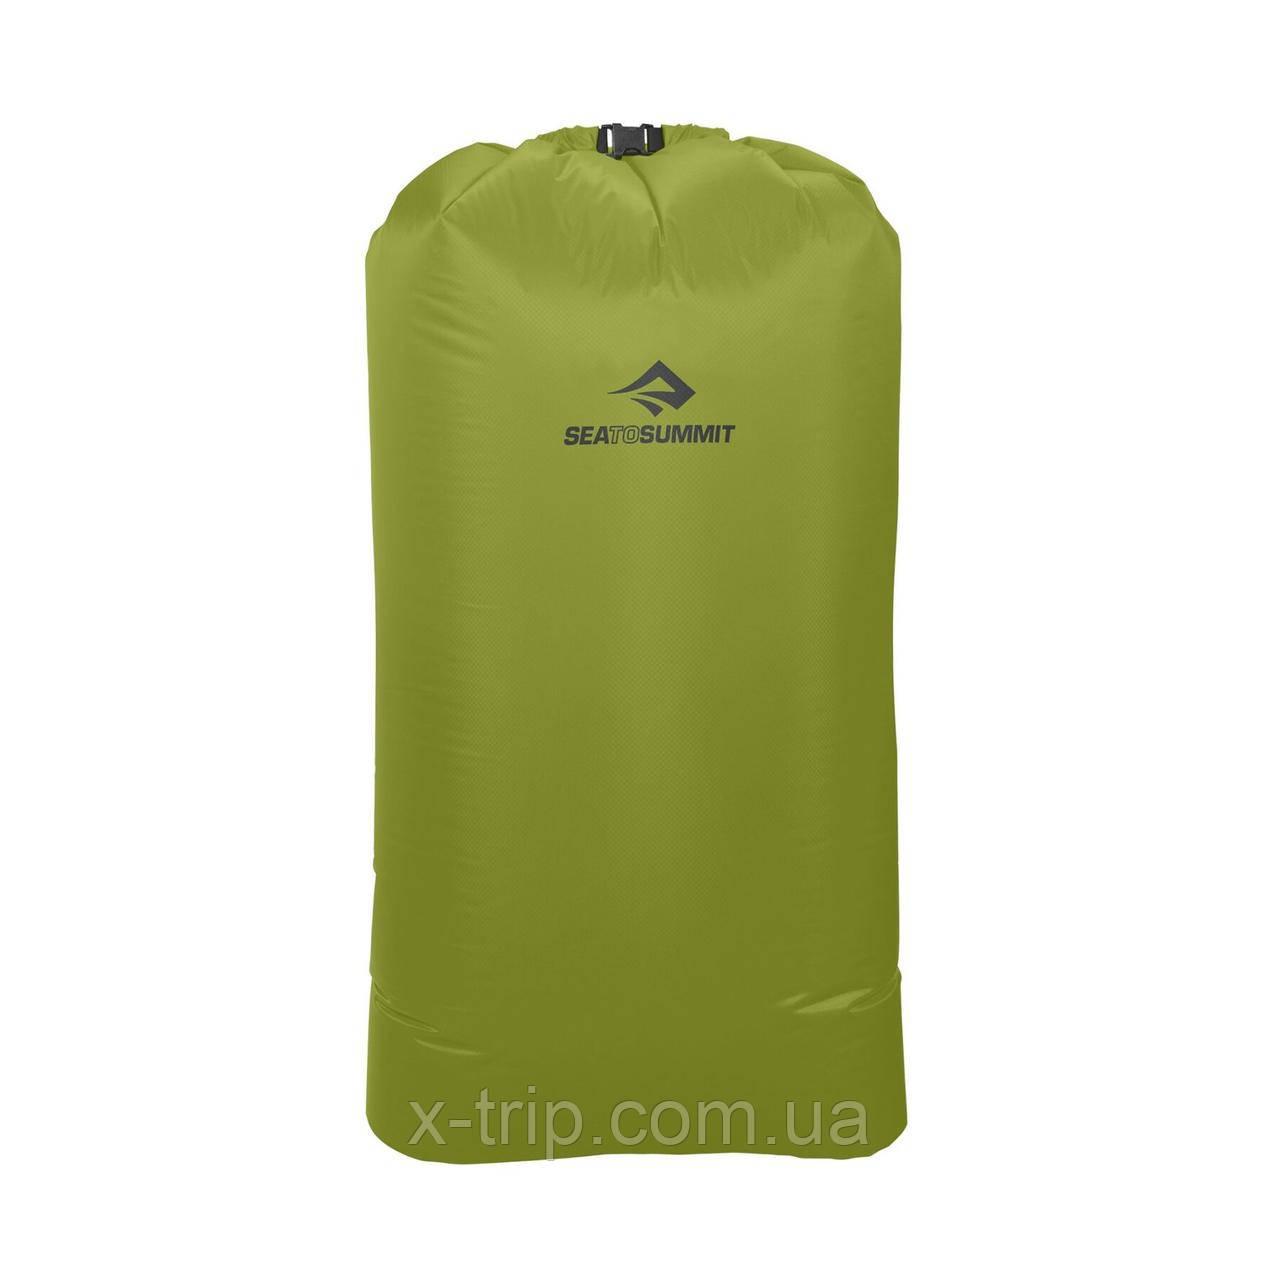 Гермомешок Sea To Summit Ultra-Sil Pack Liner Green, 70 л